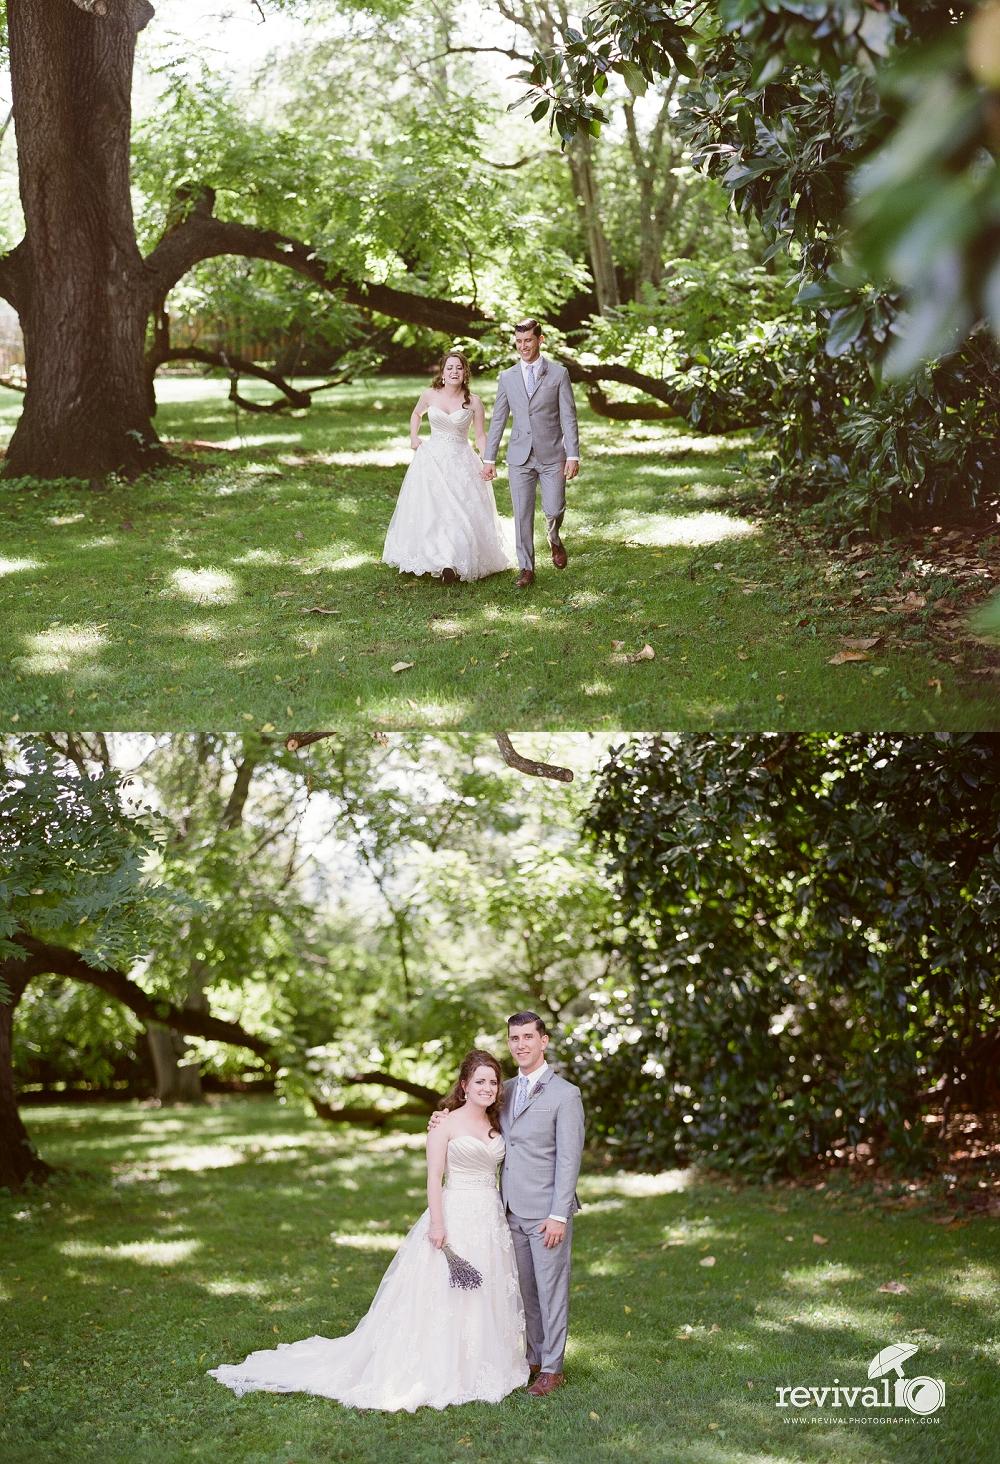 Heather + Kyle: An Intimate Ceremony at Mountain Magnolia Inn NC Wedding Photographers Revival Photography www.revivalphotography.com